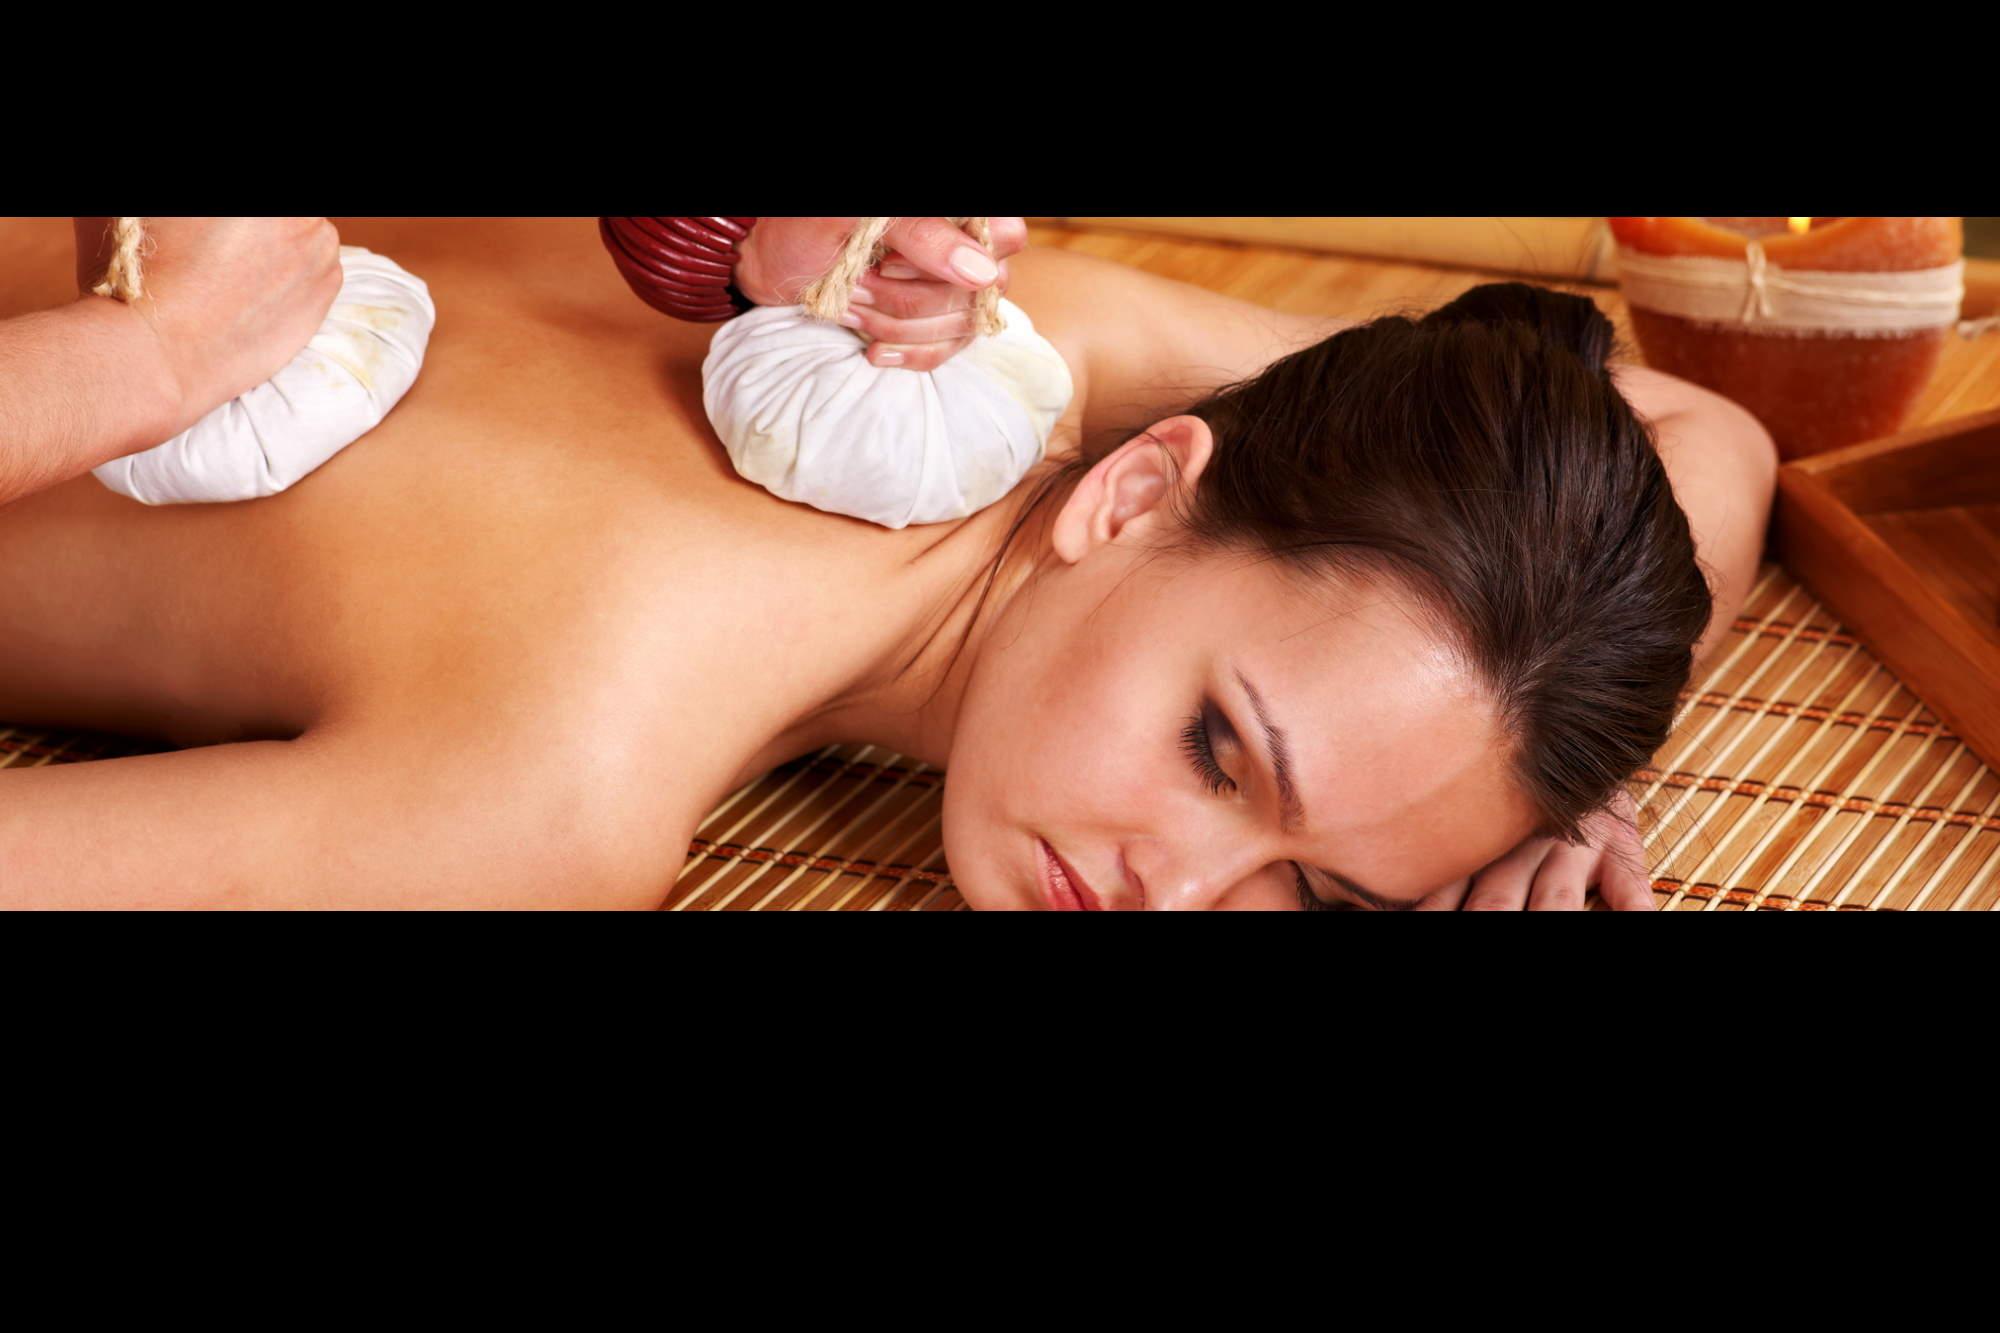 fasan-thaimassage.jimdofree.com